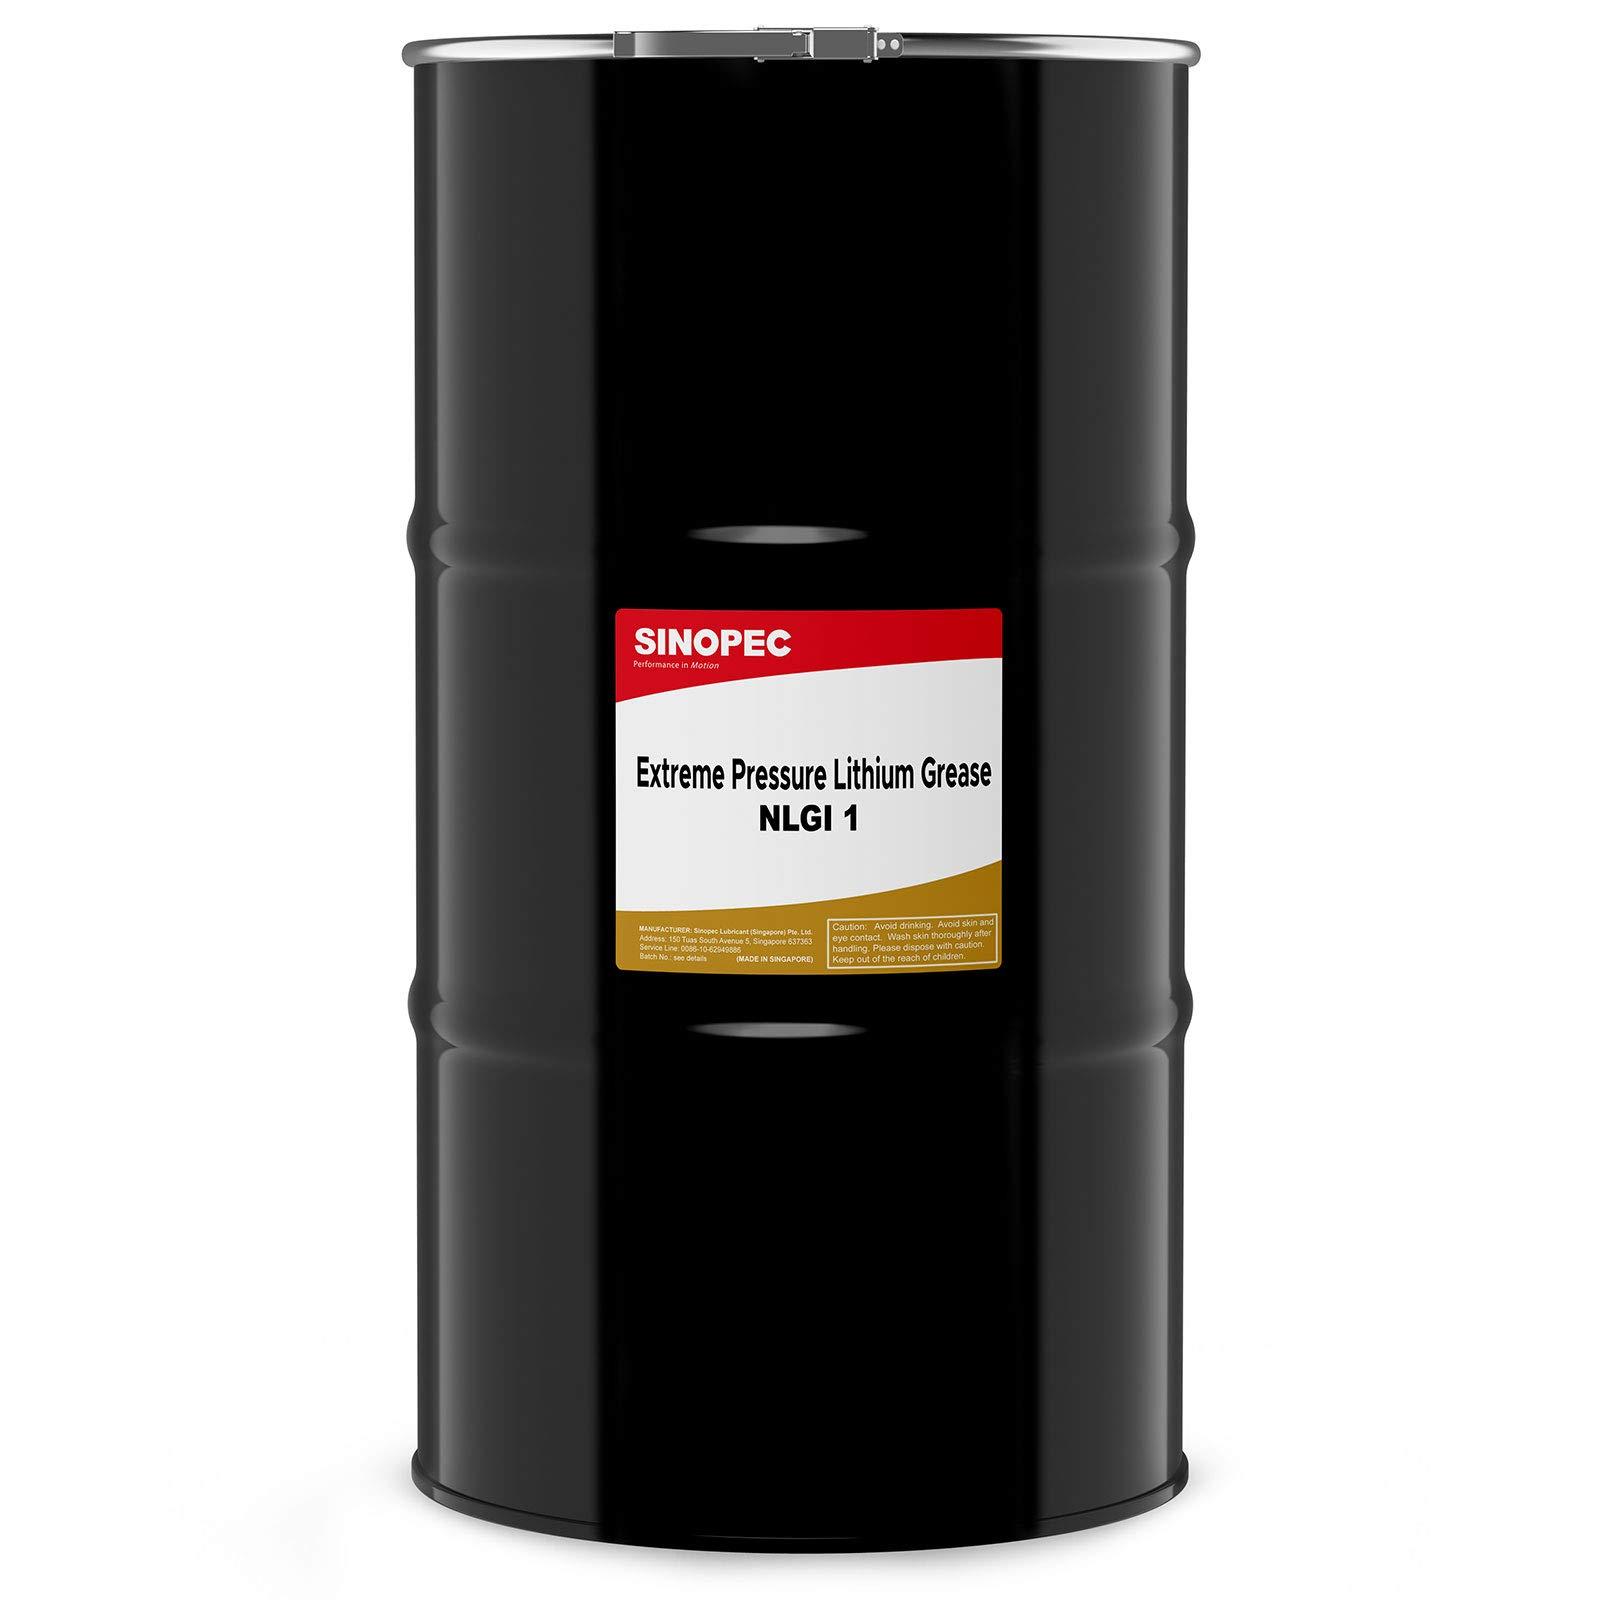 Sinopec (EP1) Extreme Pressure Multipurpose Lithium Grease, NLGI 1-120LB. (16 Gallon) Keg